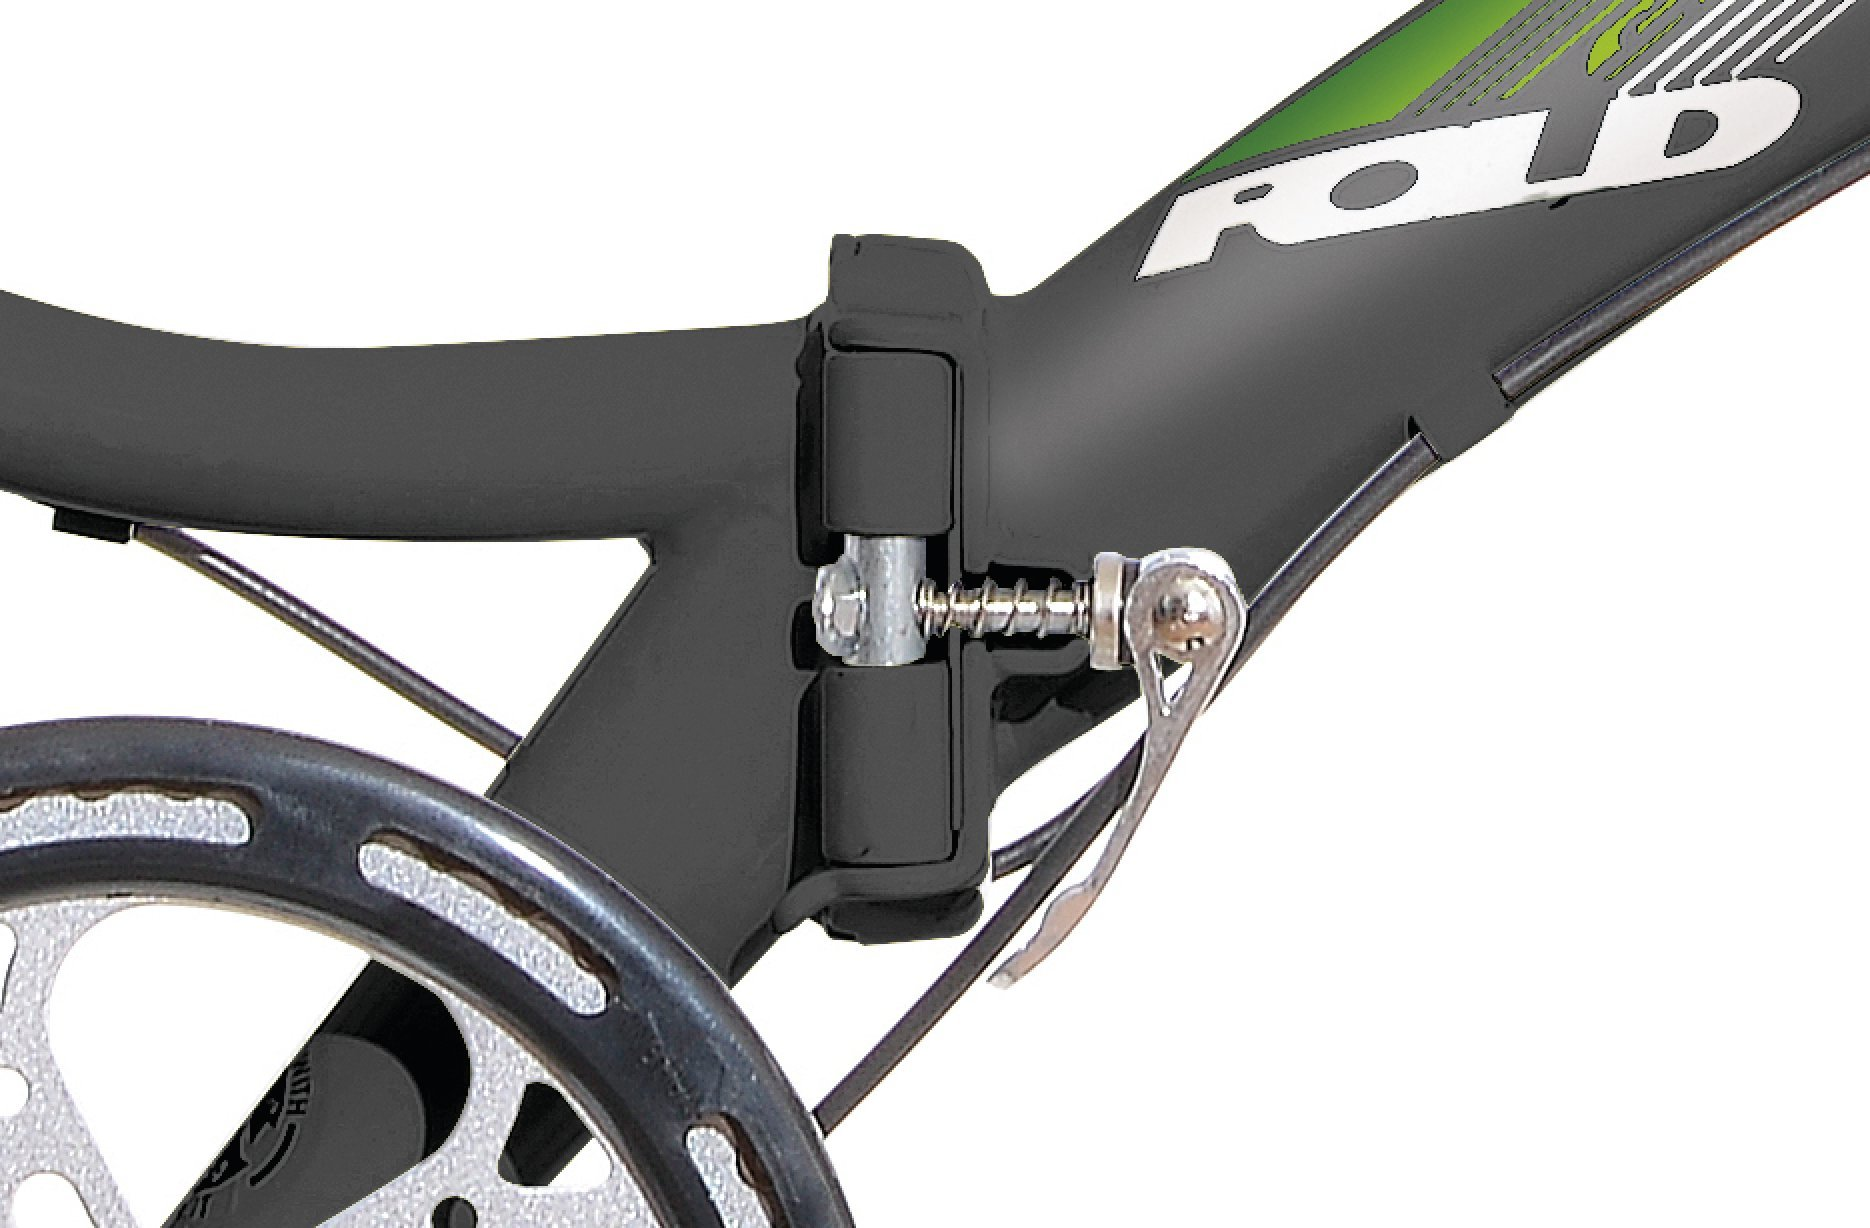 Atala Greenbay - Bicicleta plegable de 20 pulgadas en color ...